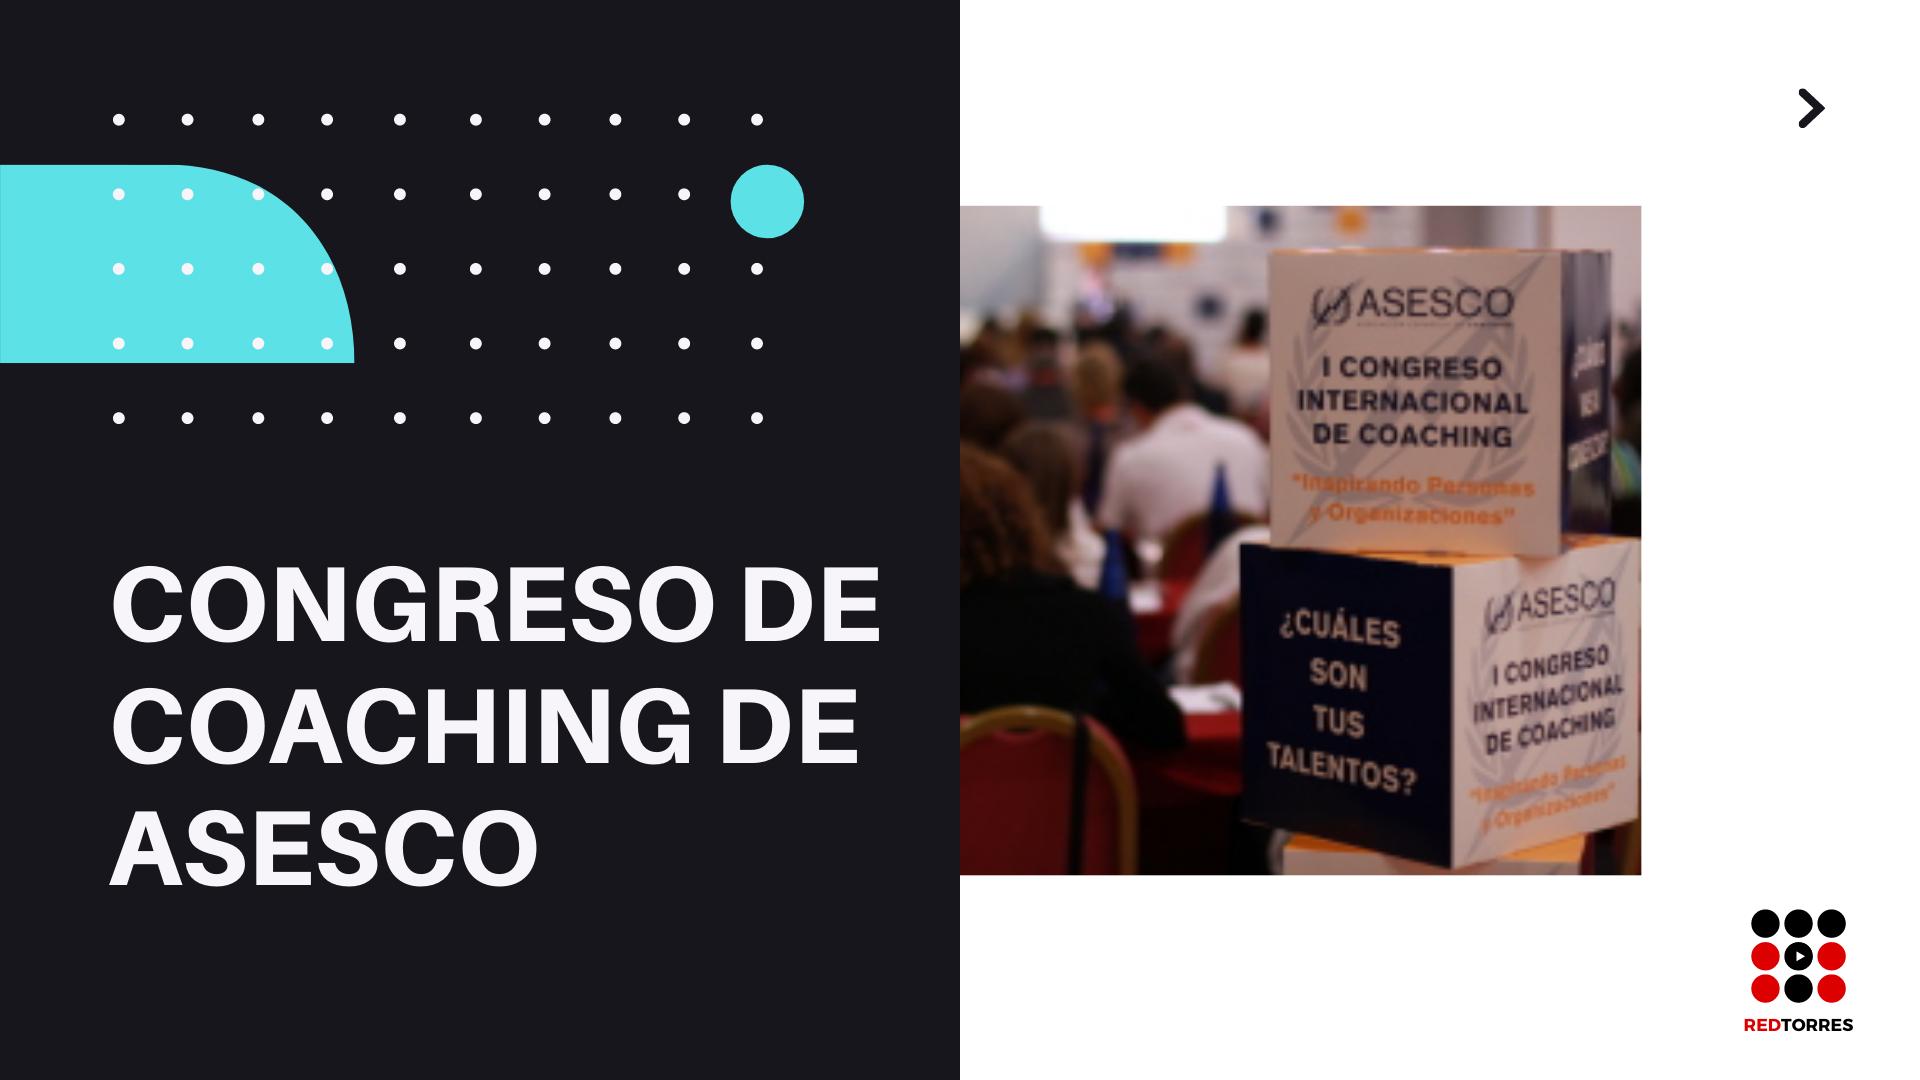 Congreso de Coaching | Video Congresos | Fotografía Congresos | REDTORRES